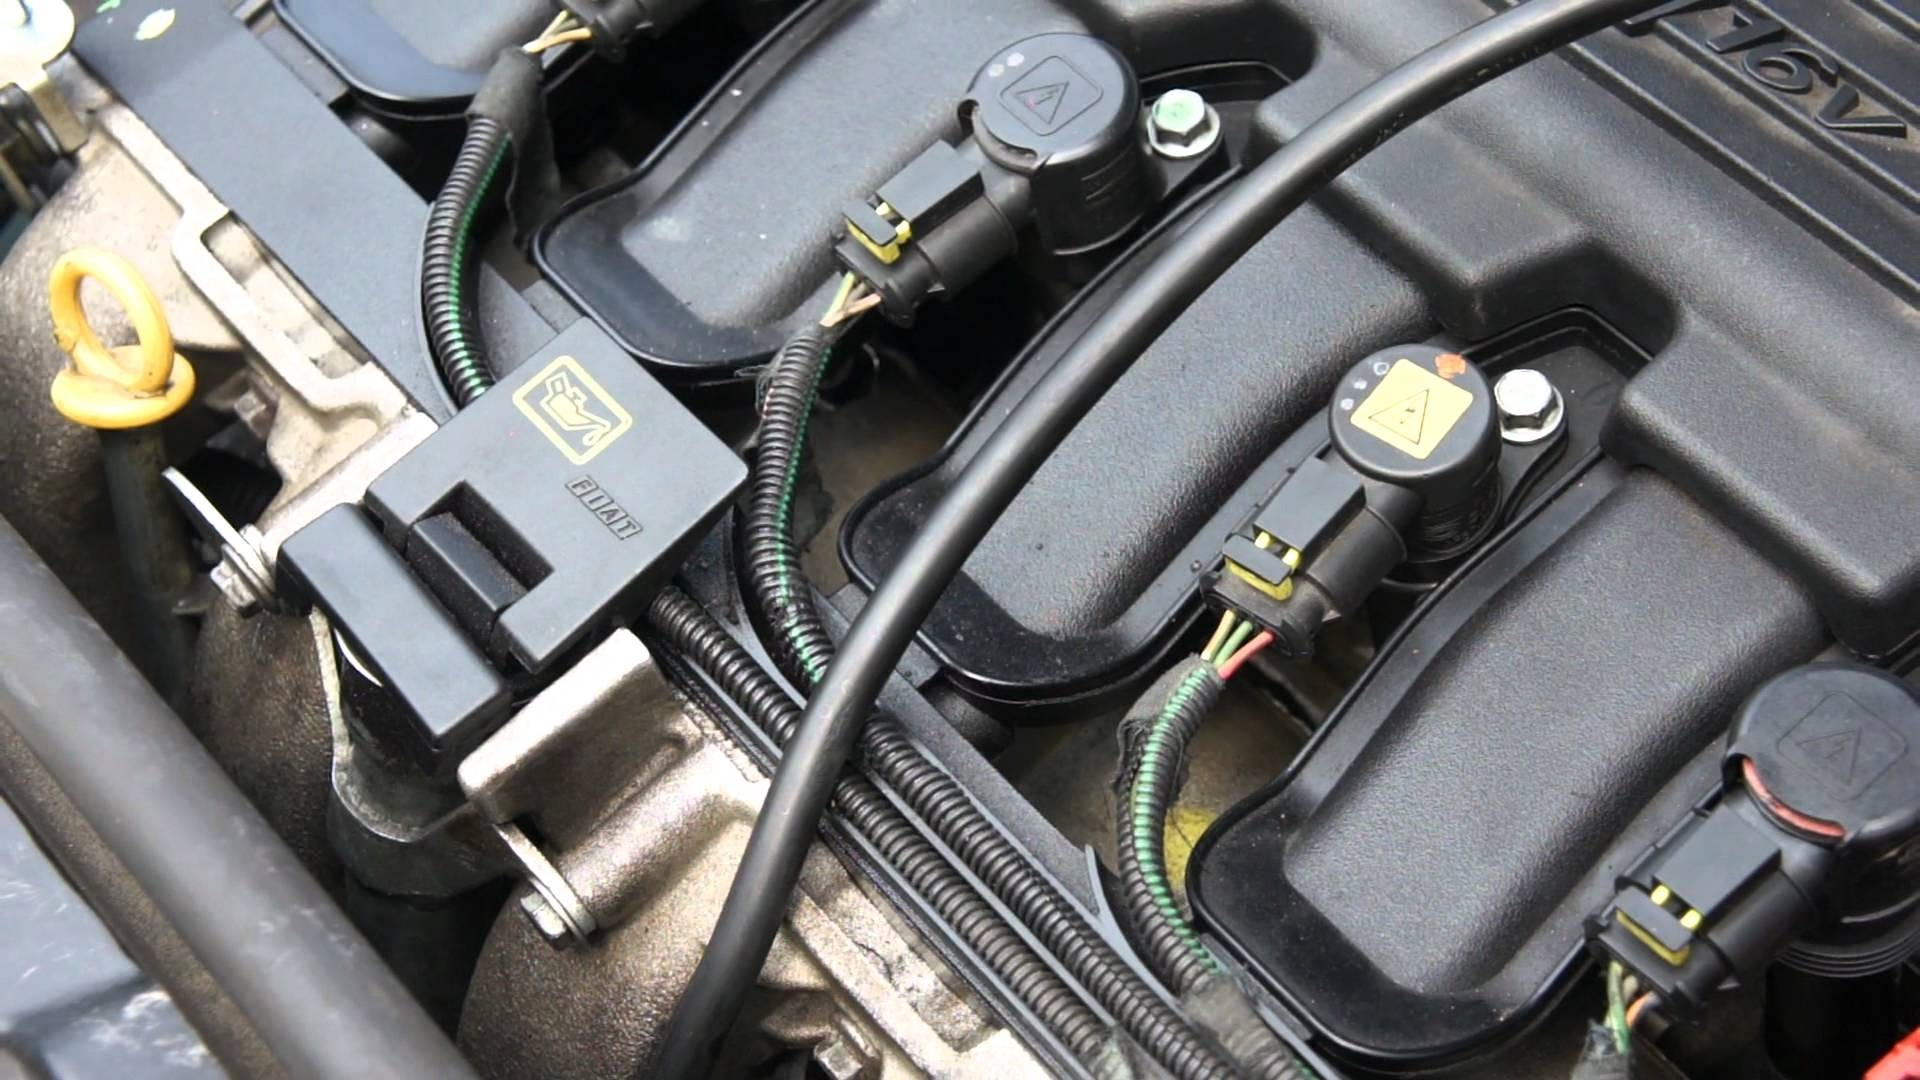 Fiat Uno Engine Diagram Fiat Stilo 1 6 16v 2002 Engine Fail Of Fiat Uno Engine Diagram